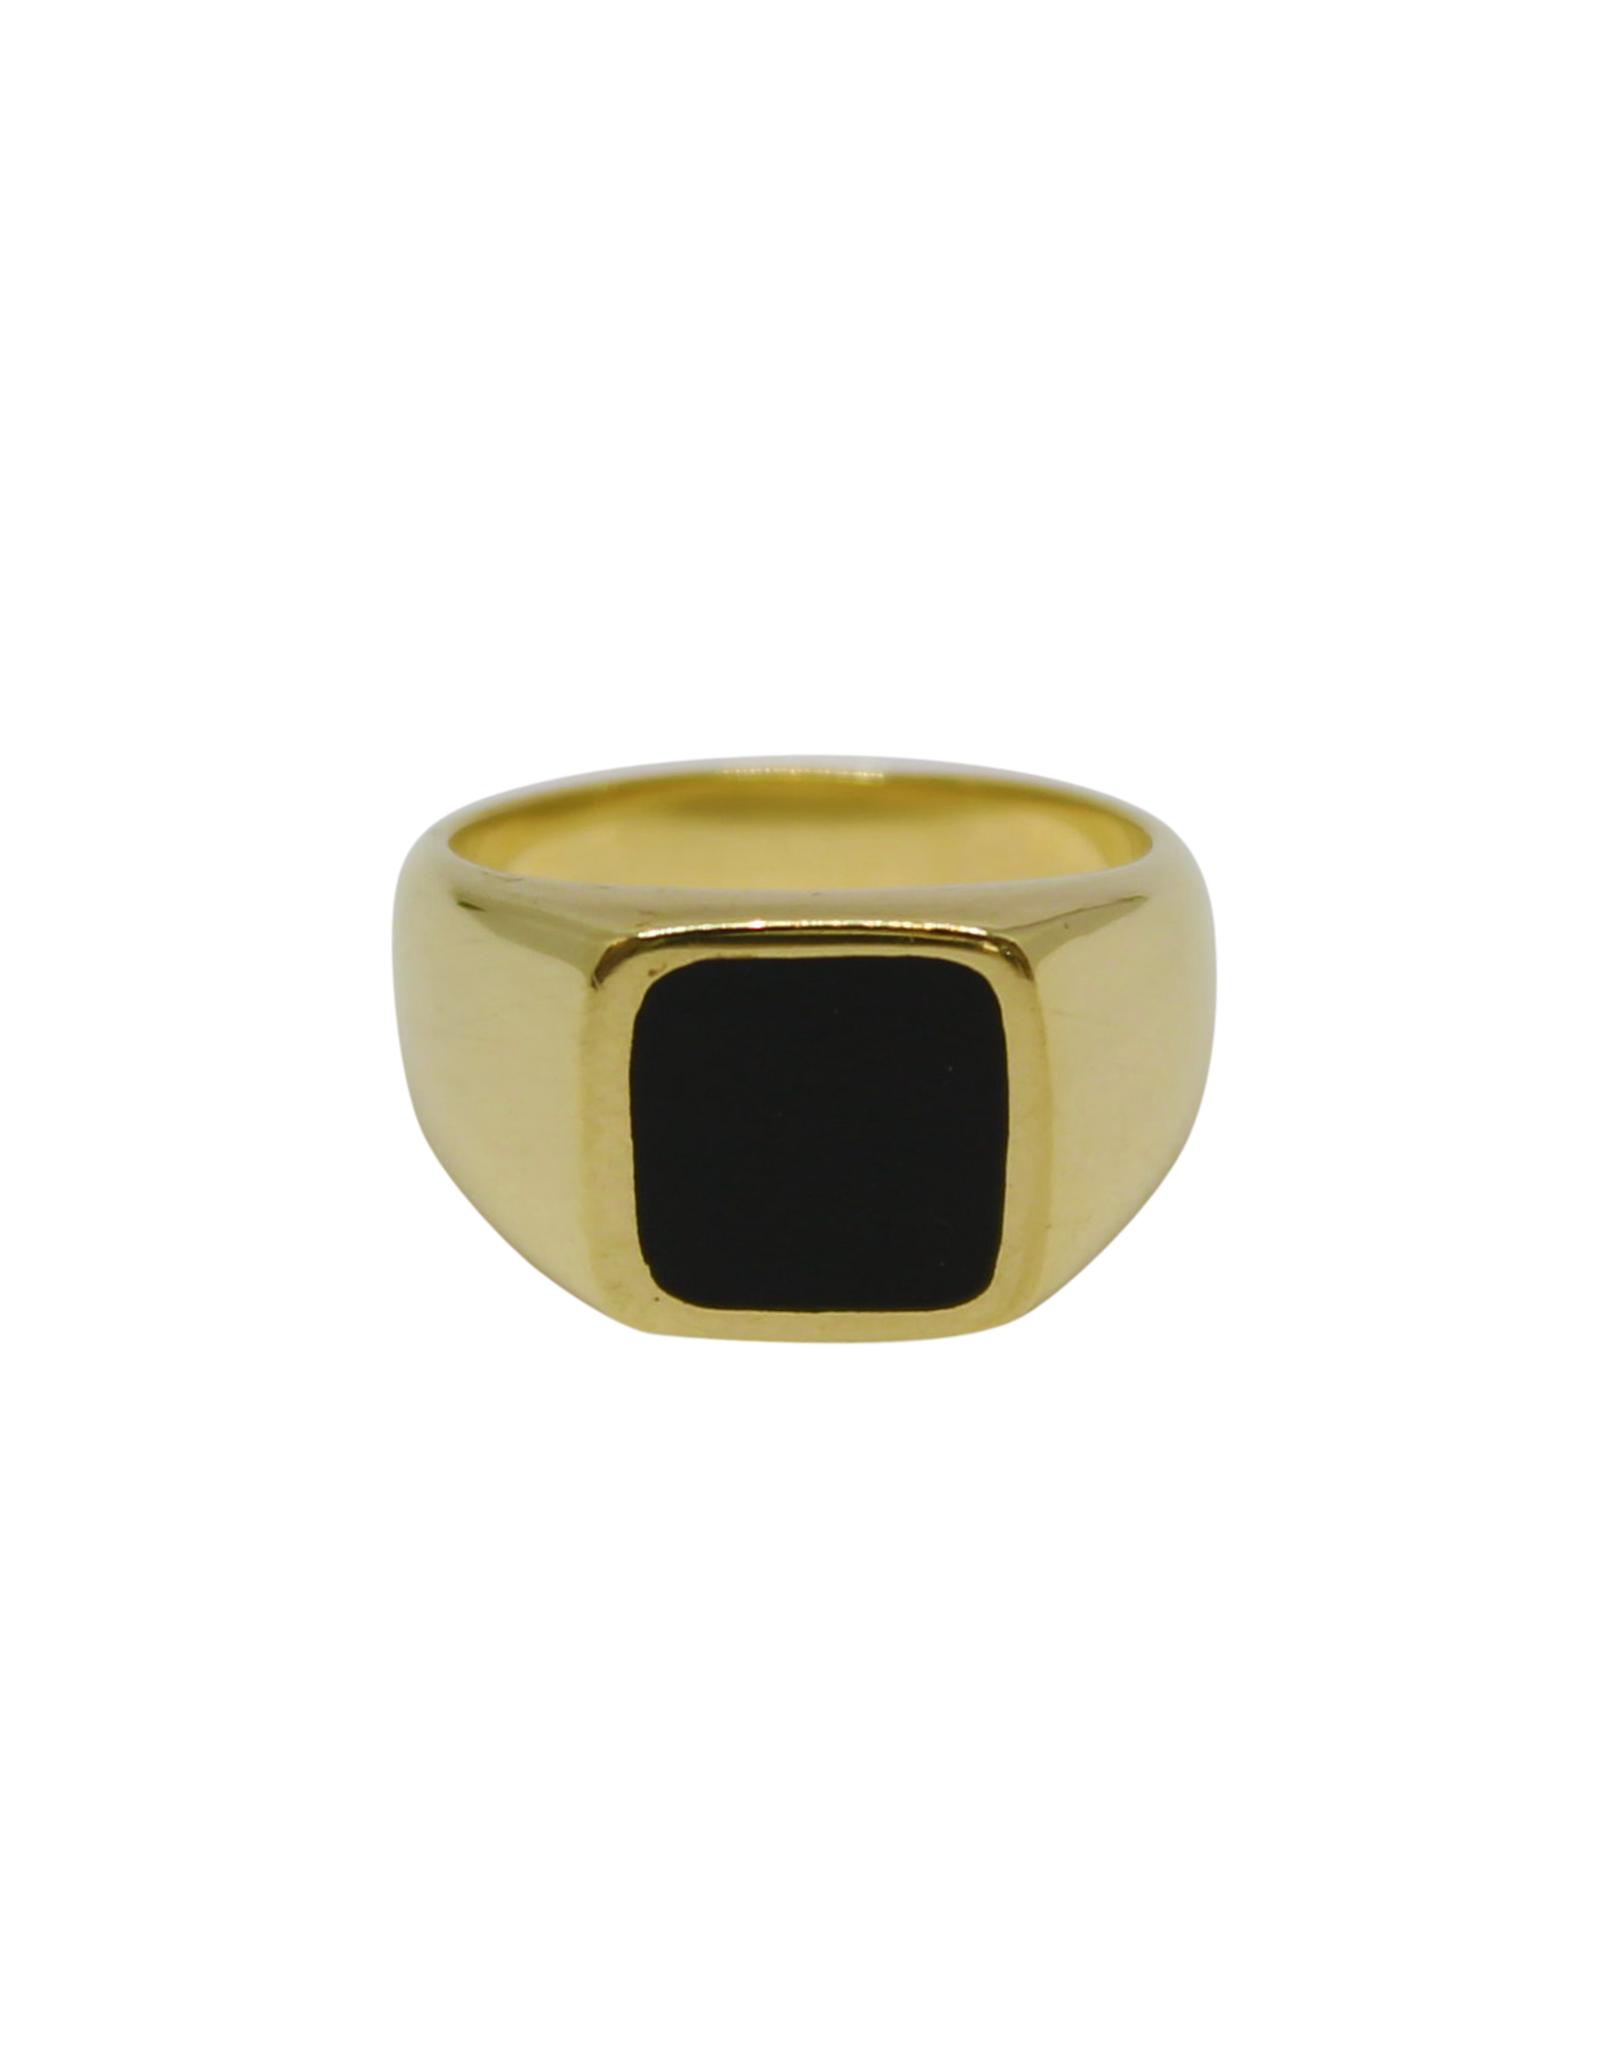 Vayu Jewels Jolie Ring - Sz. 7